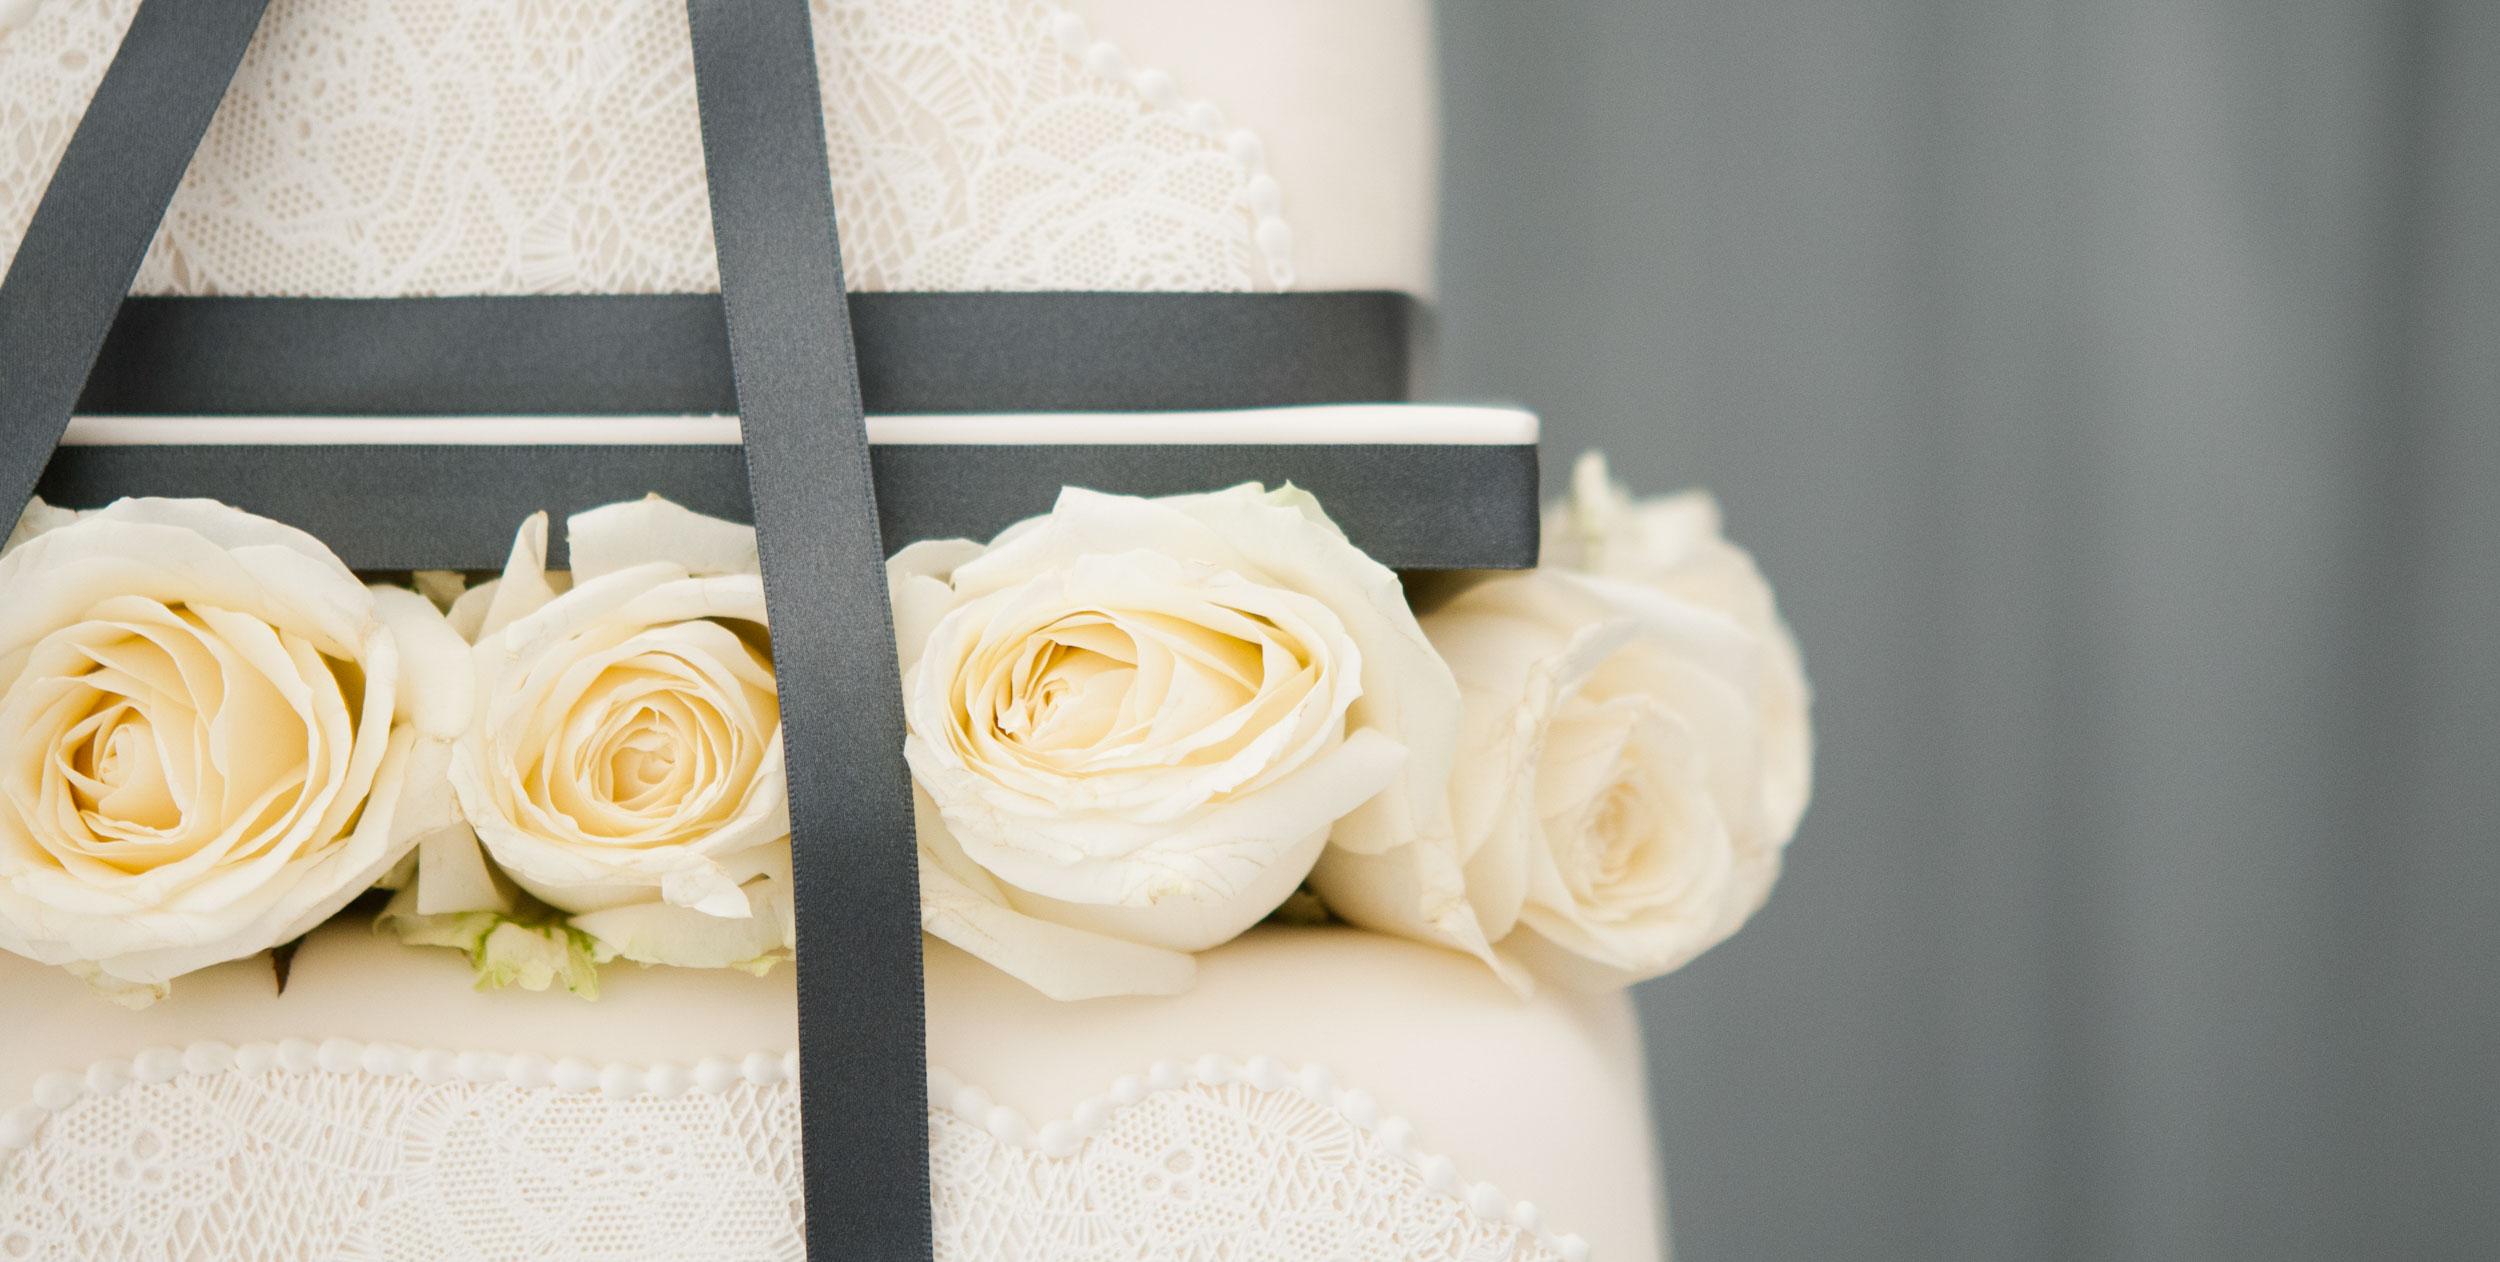 wedding-cake-ribbon-flower-1.jpg